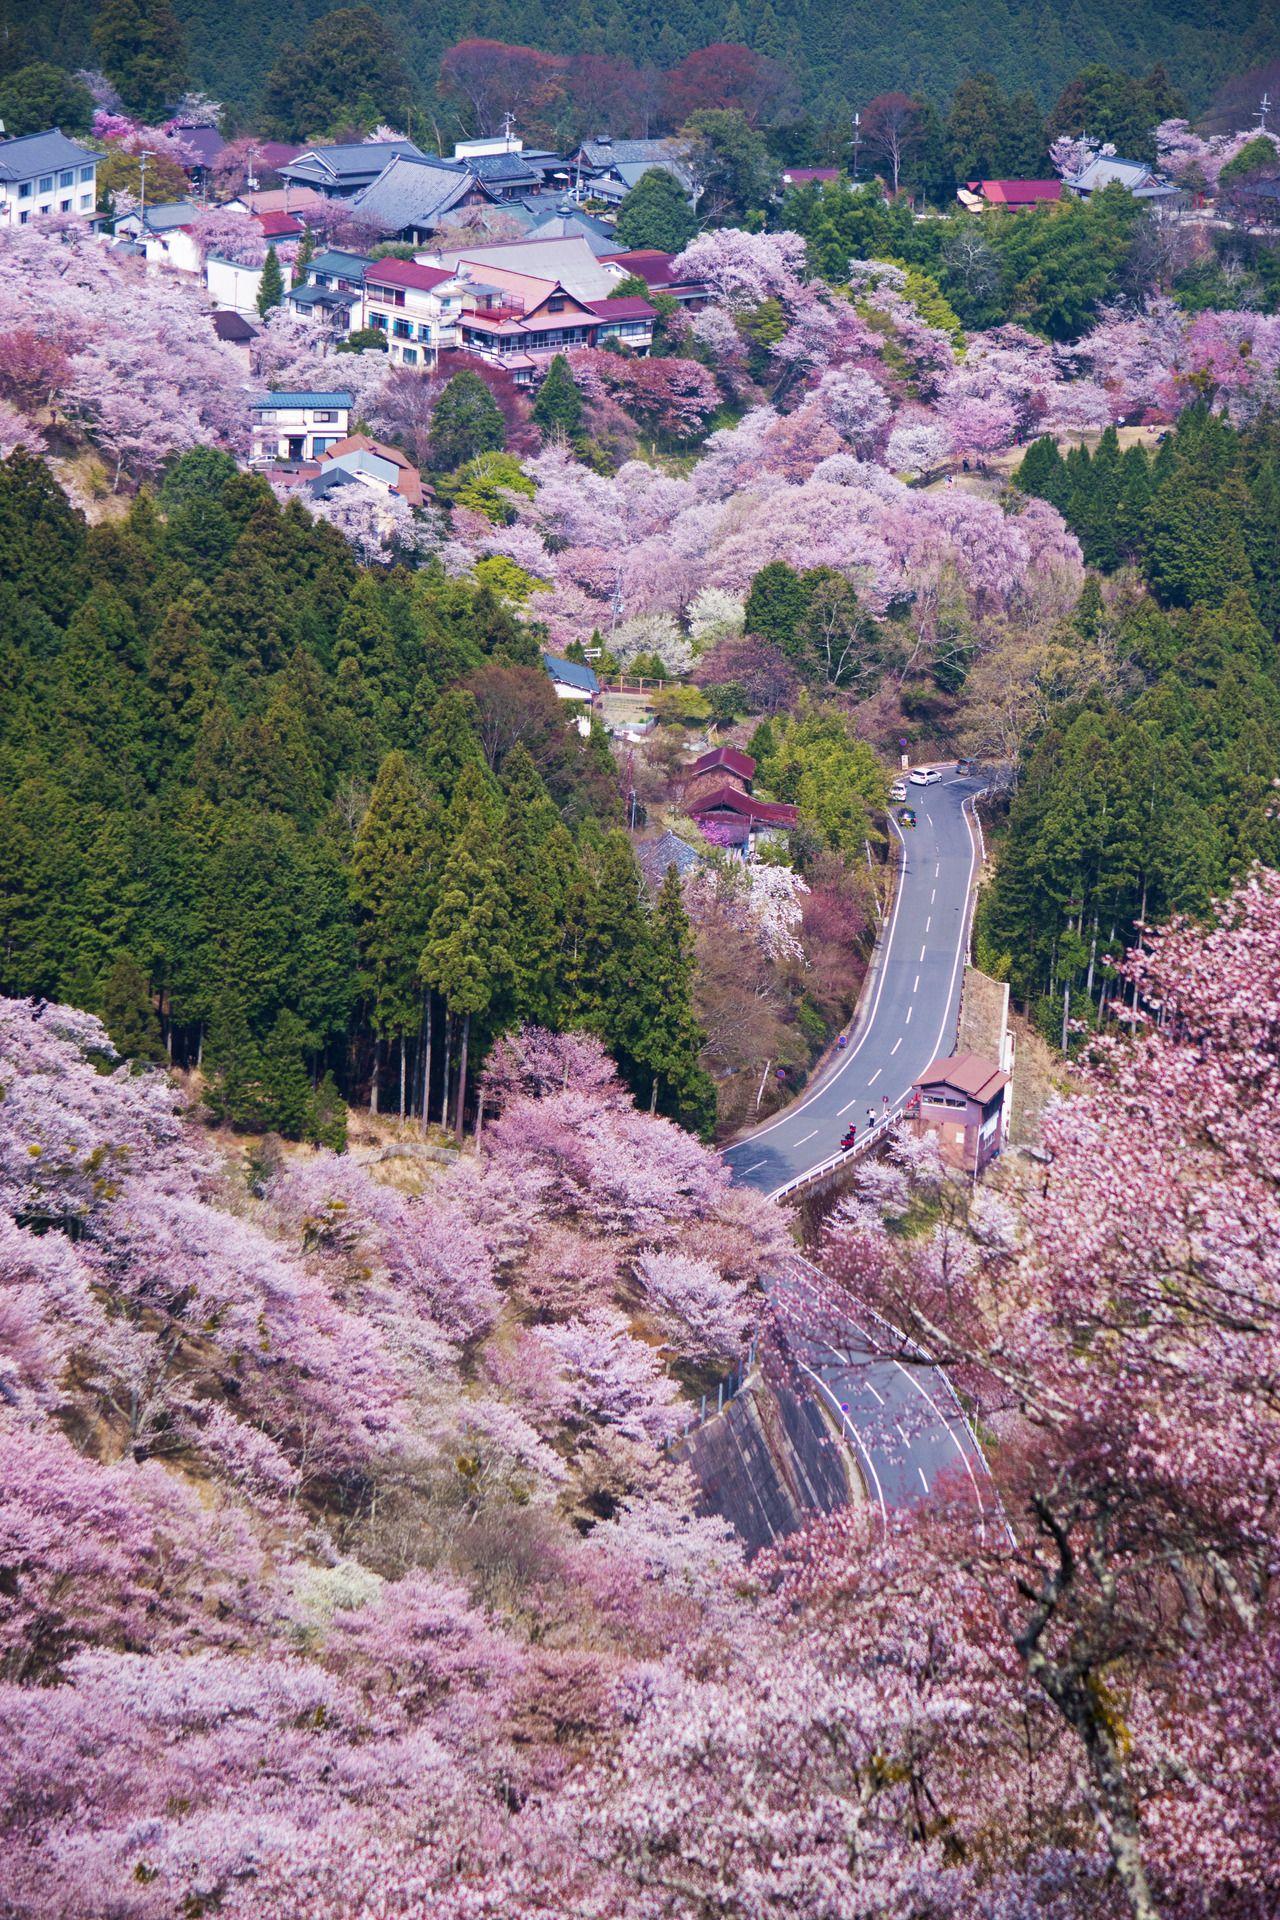 Yerrr Inefekt69 Mt Yoshino Nara Japan Japan Travel Beautiful Places To Travel Nara Japan